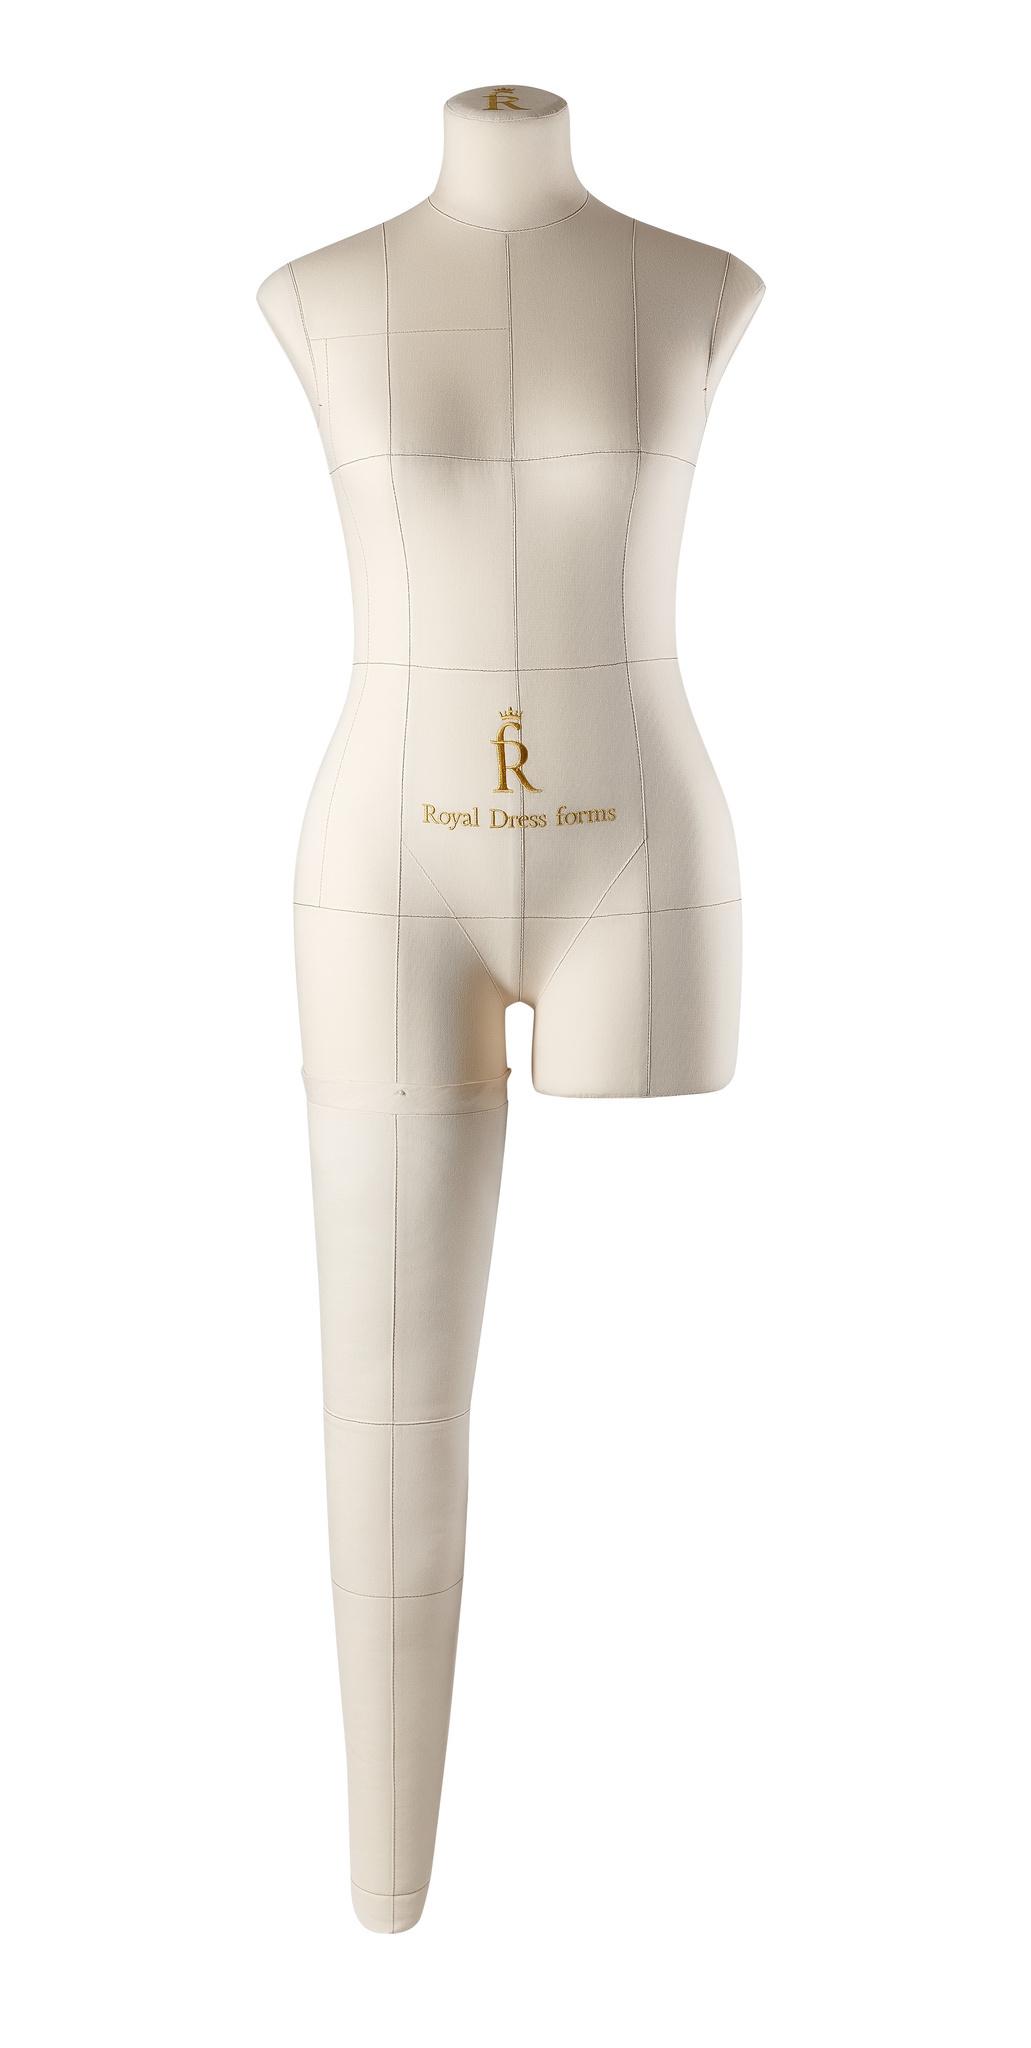 Нога для манекена Моника, размер 44 тип фигуры Прямоугольник, бежеваяФото 0